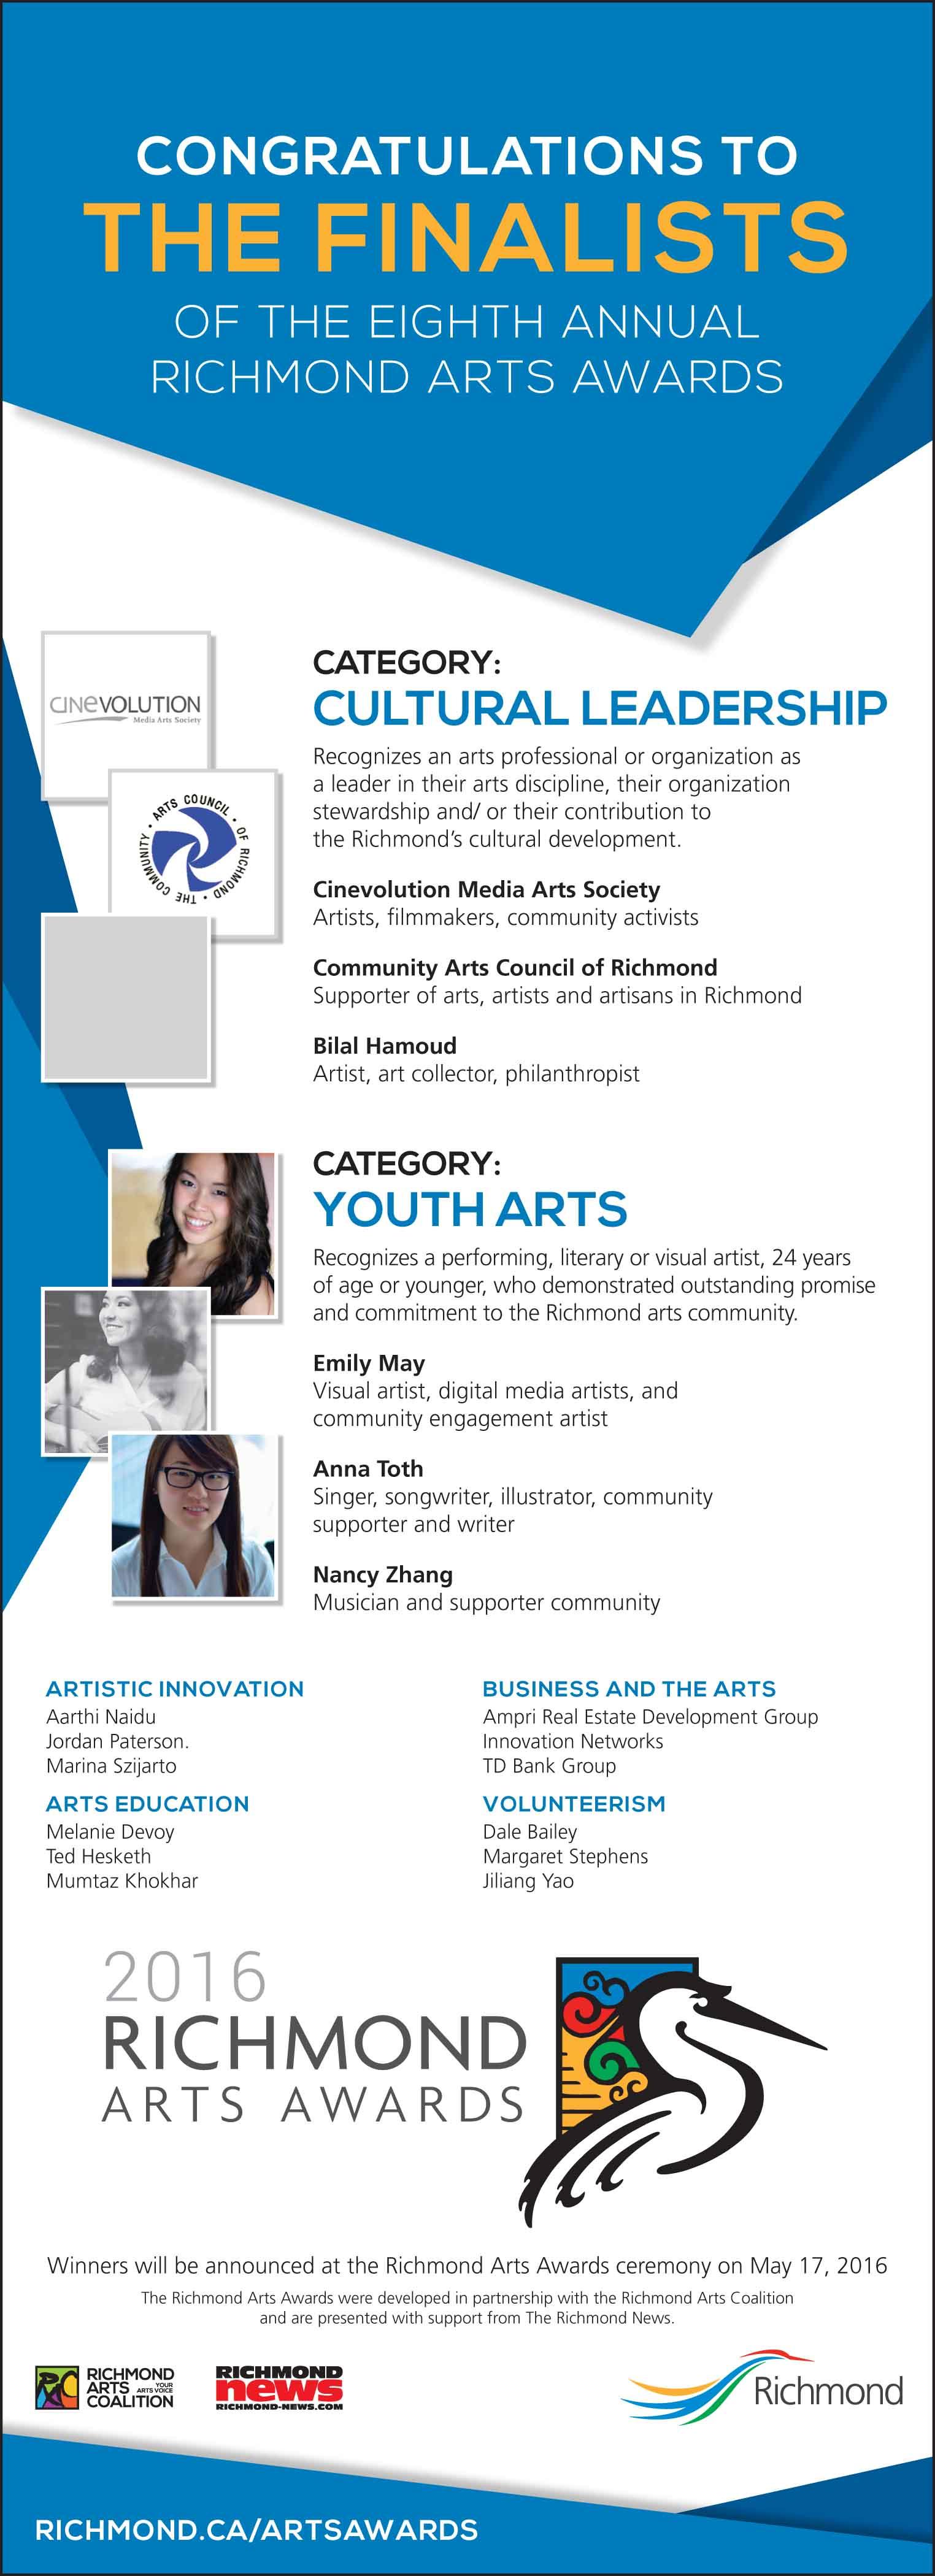 2016_Arts Awards_Finalists_Half Page Ad_3